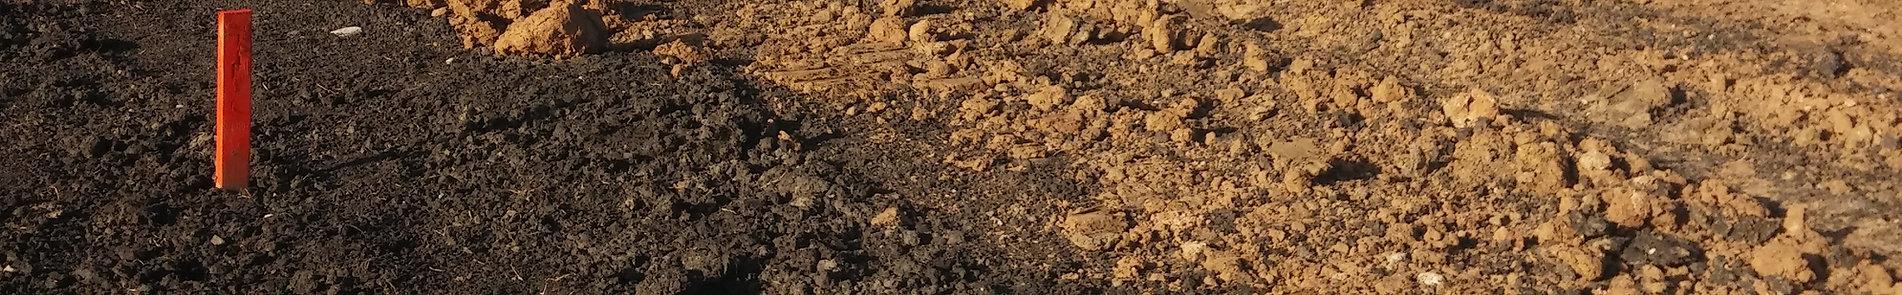 Black mulch and tilled brown dirt ground